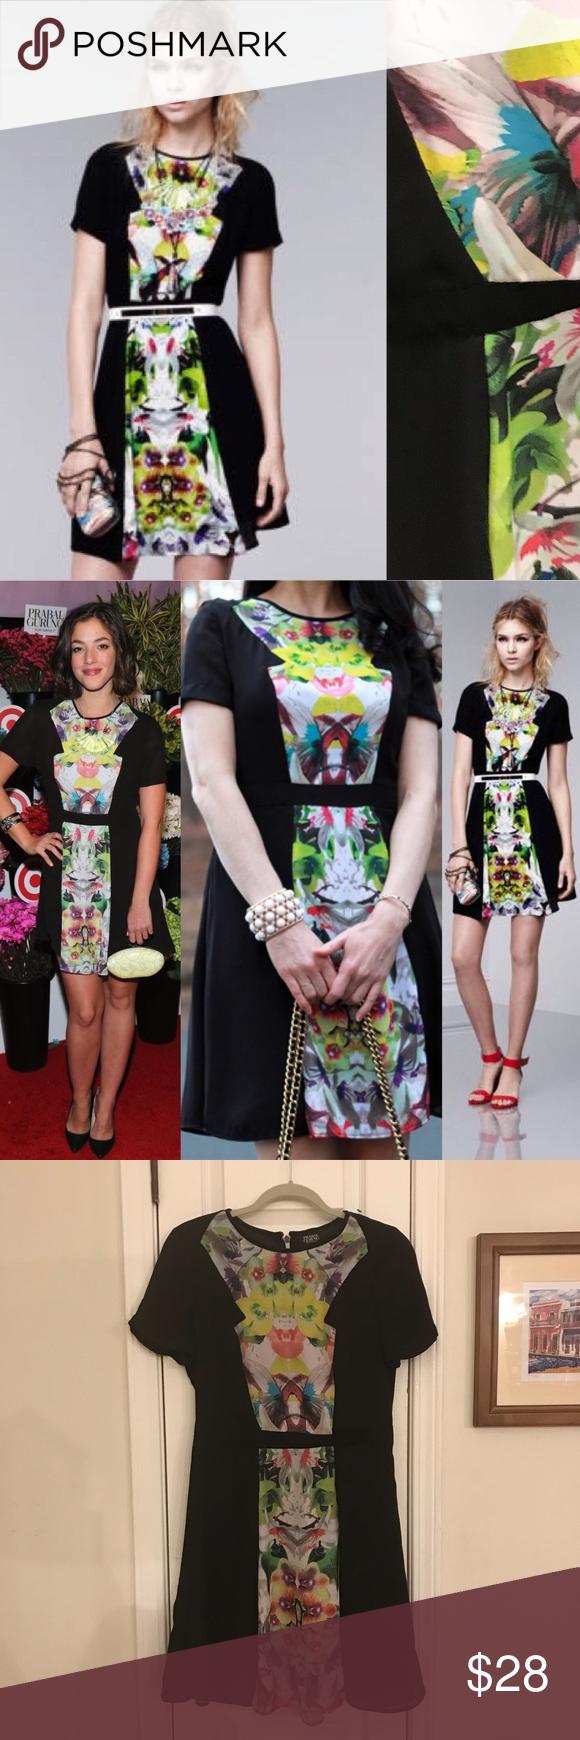 Prabal Gurung For Target Black Floral Dress Sz8 Gorgeous Paral Gurung For Target Exclusive Collection Dress Floral Dress Black Prabal Gurung Clothes Design [ 1740 x 580 Pixel ]